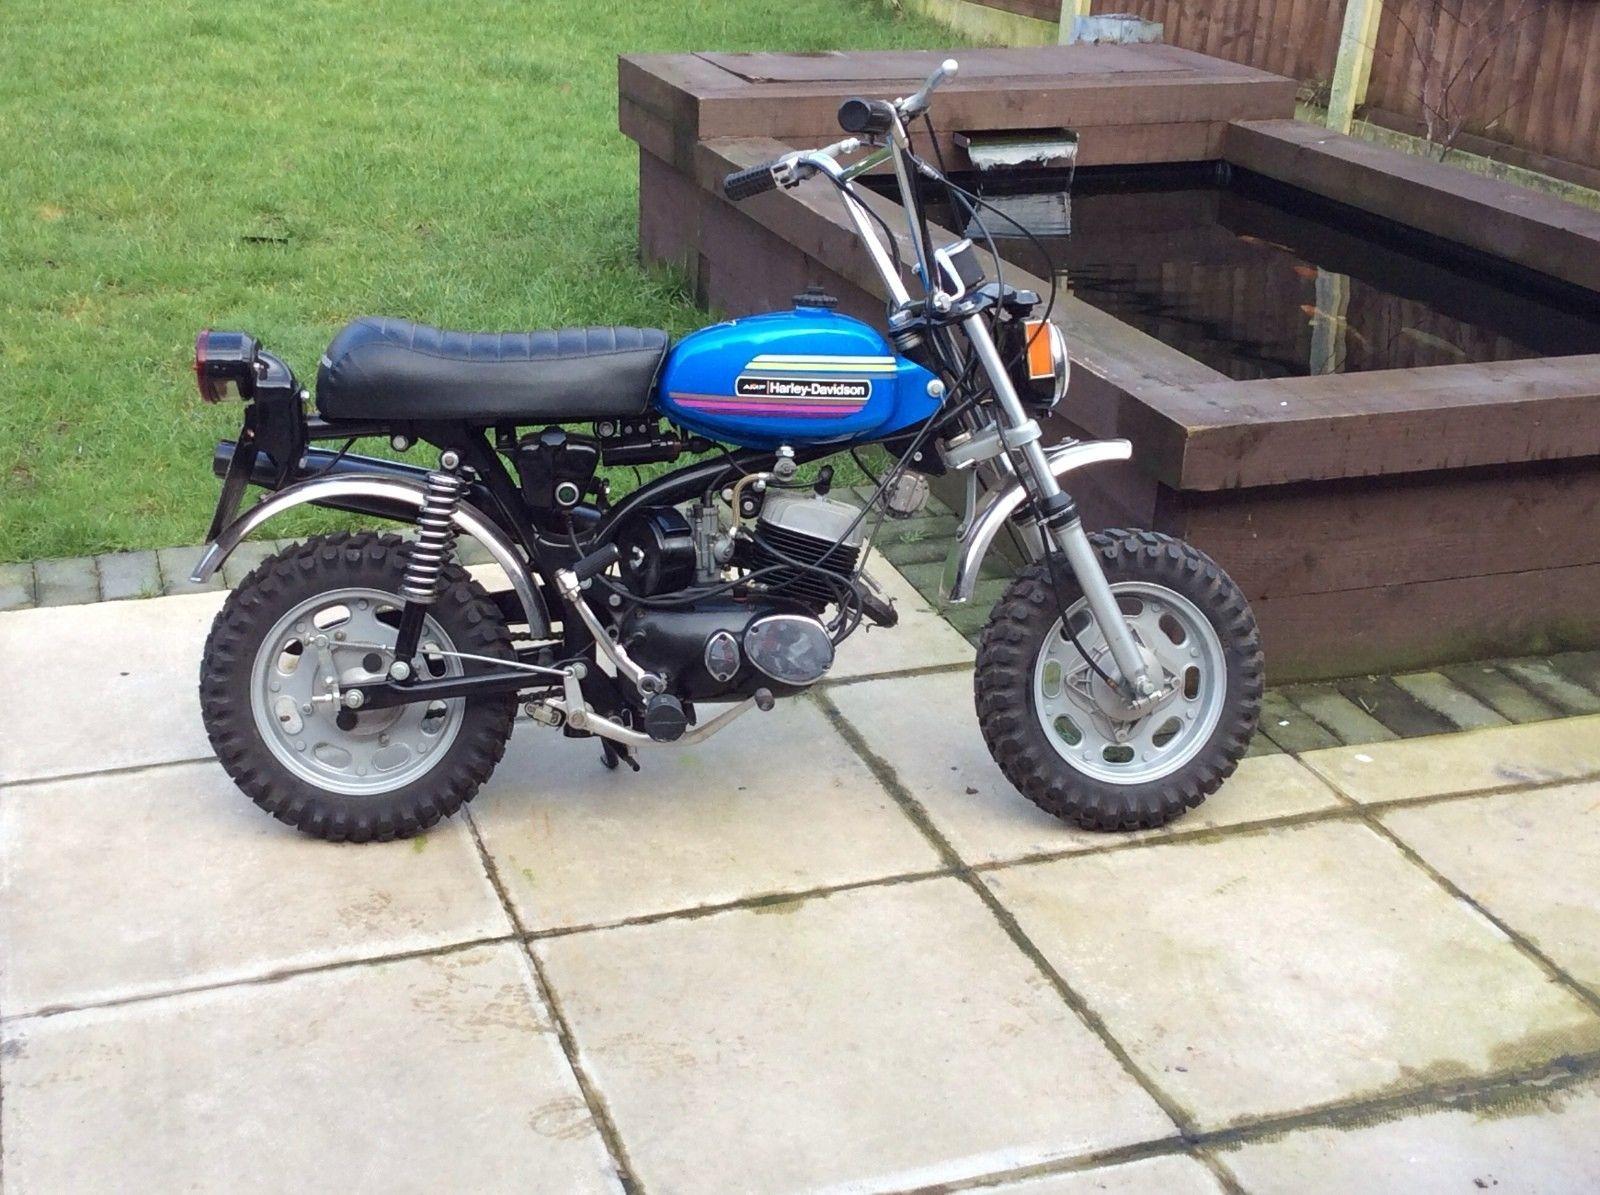 Ebay 1974 Harley Davidson X90 Amf Monkey Bike Stunning Bike Road Reg Low Miles Harleydavidson Ukdeals Rssdata Net